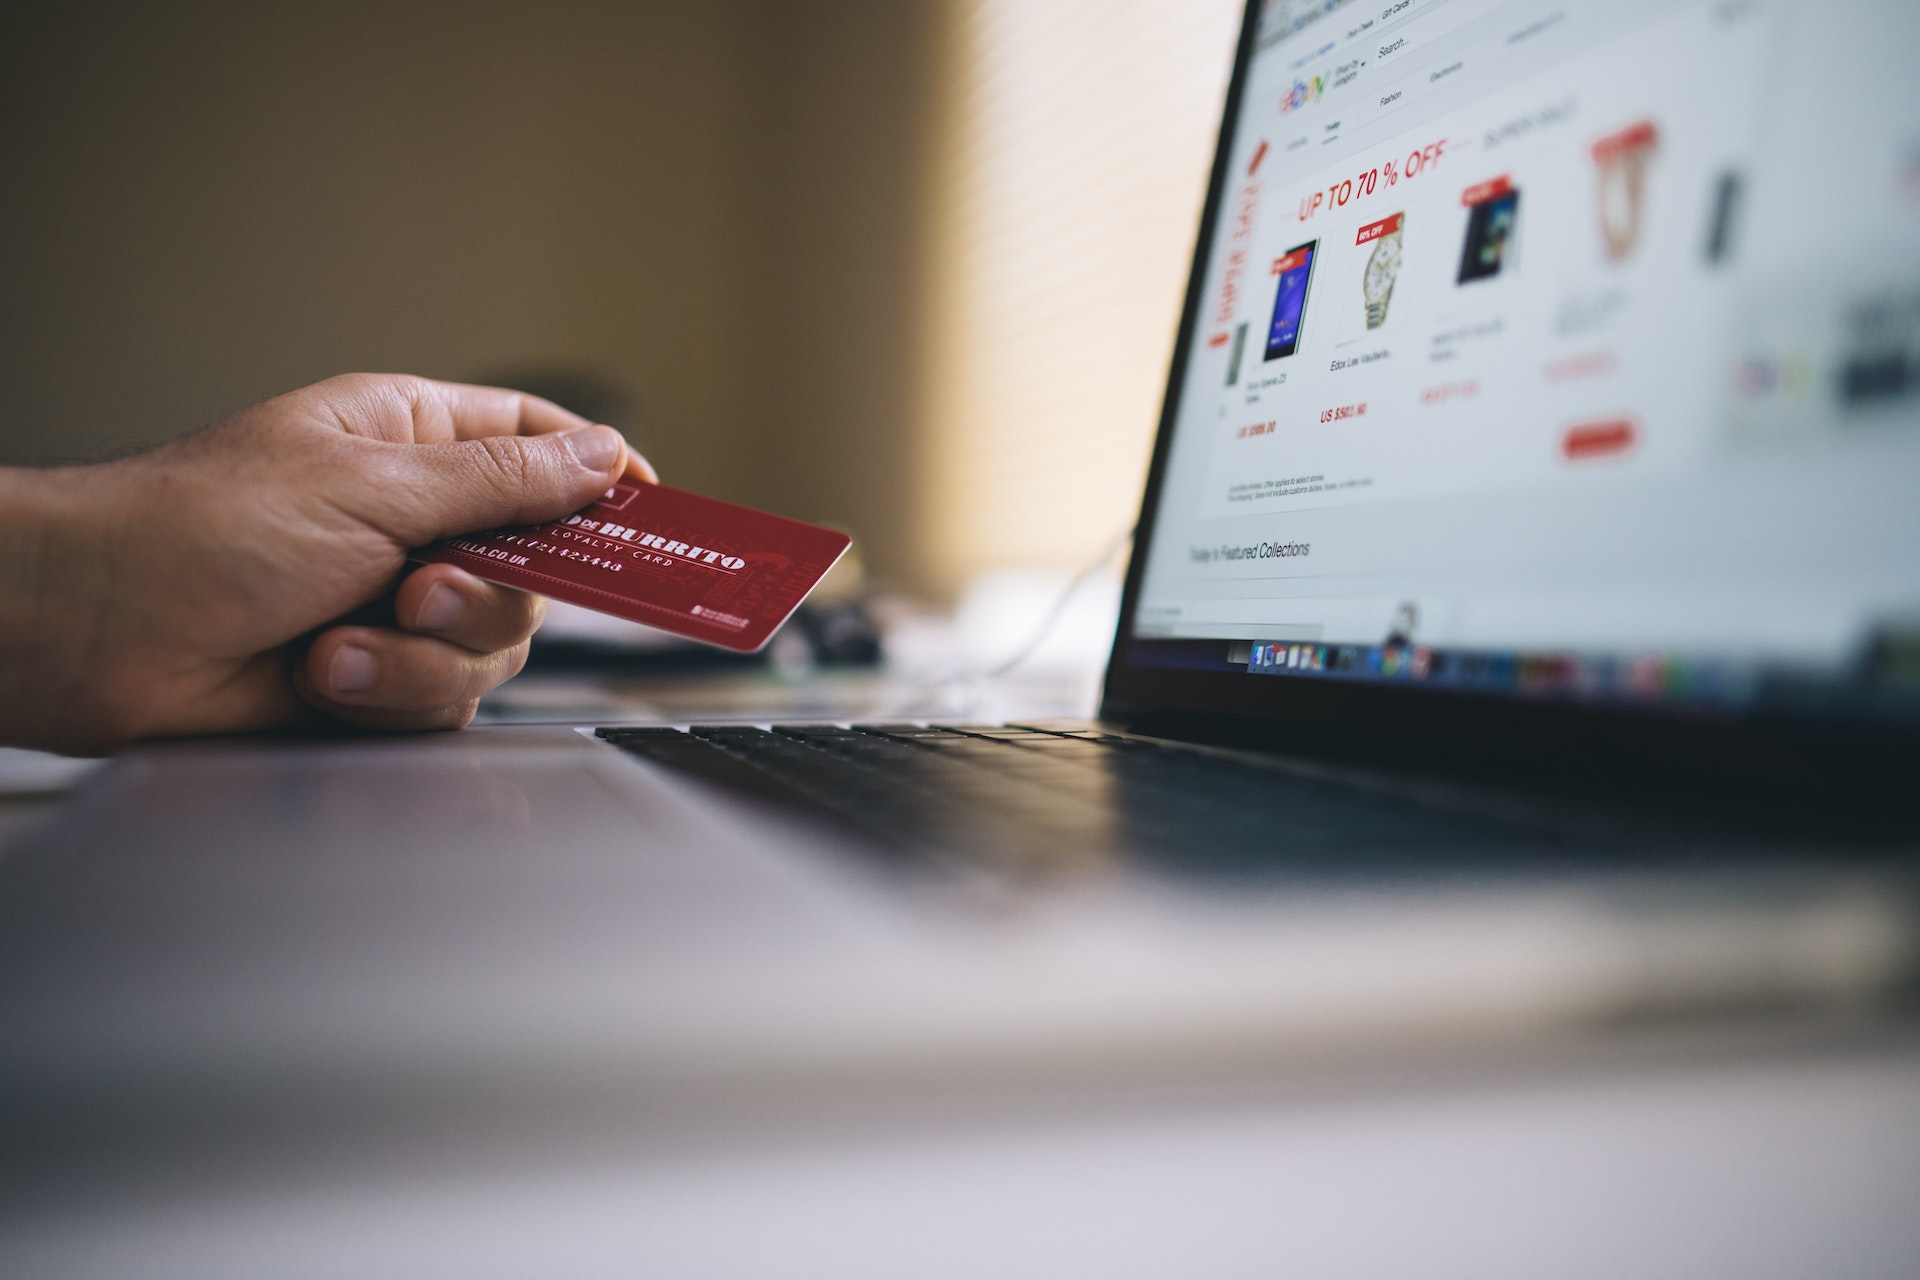 How Bad Website Designs Kills Your Business